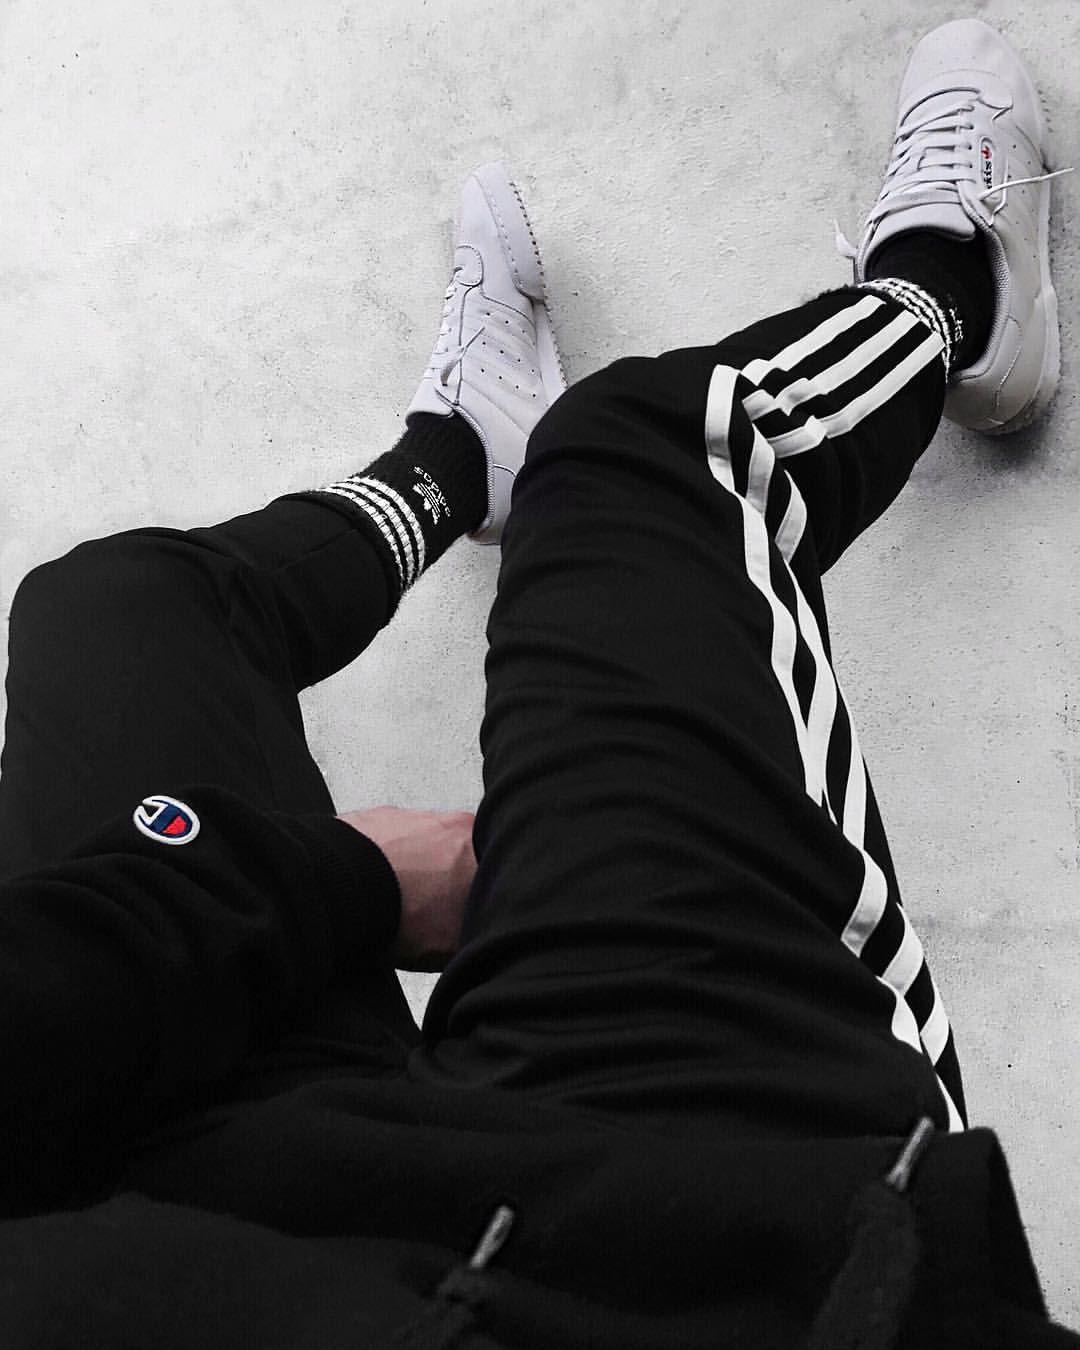 Phrases Champion X Tumblr Adidas ByedriancortesWallpapers hQtsCrd